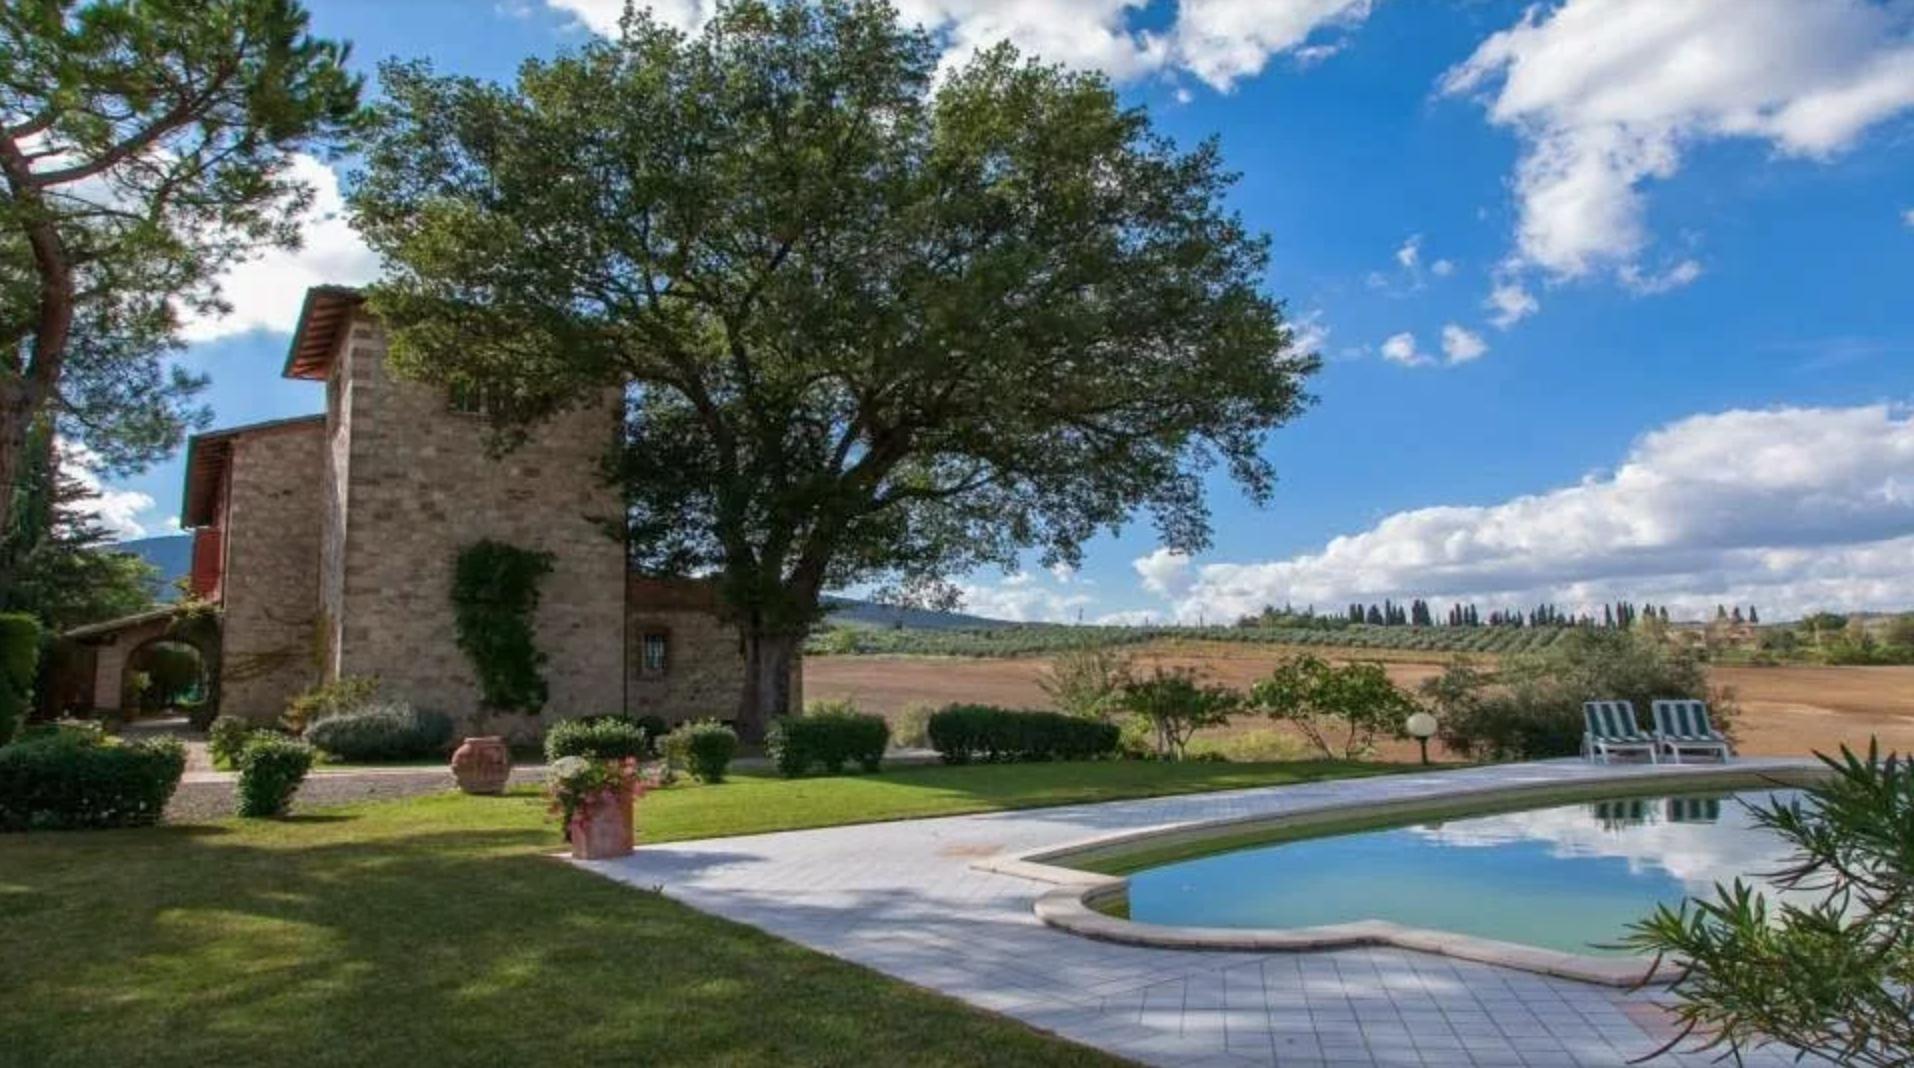 18th Century Tuscany Property - PFI International Ltd